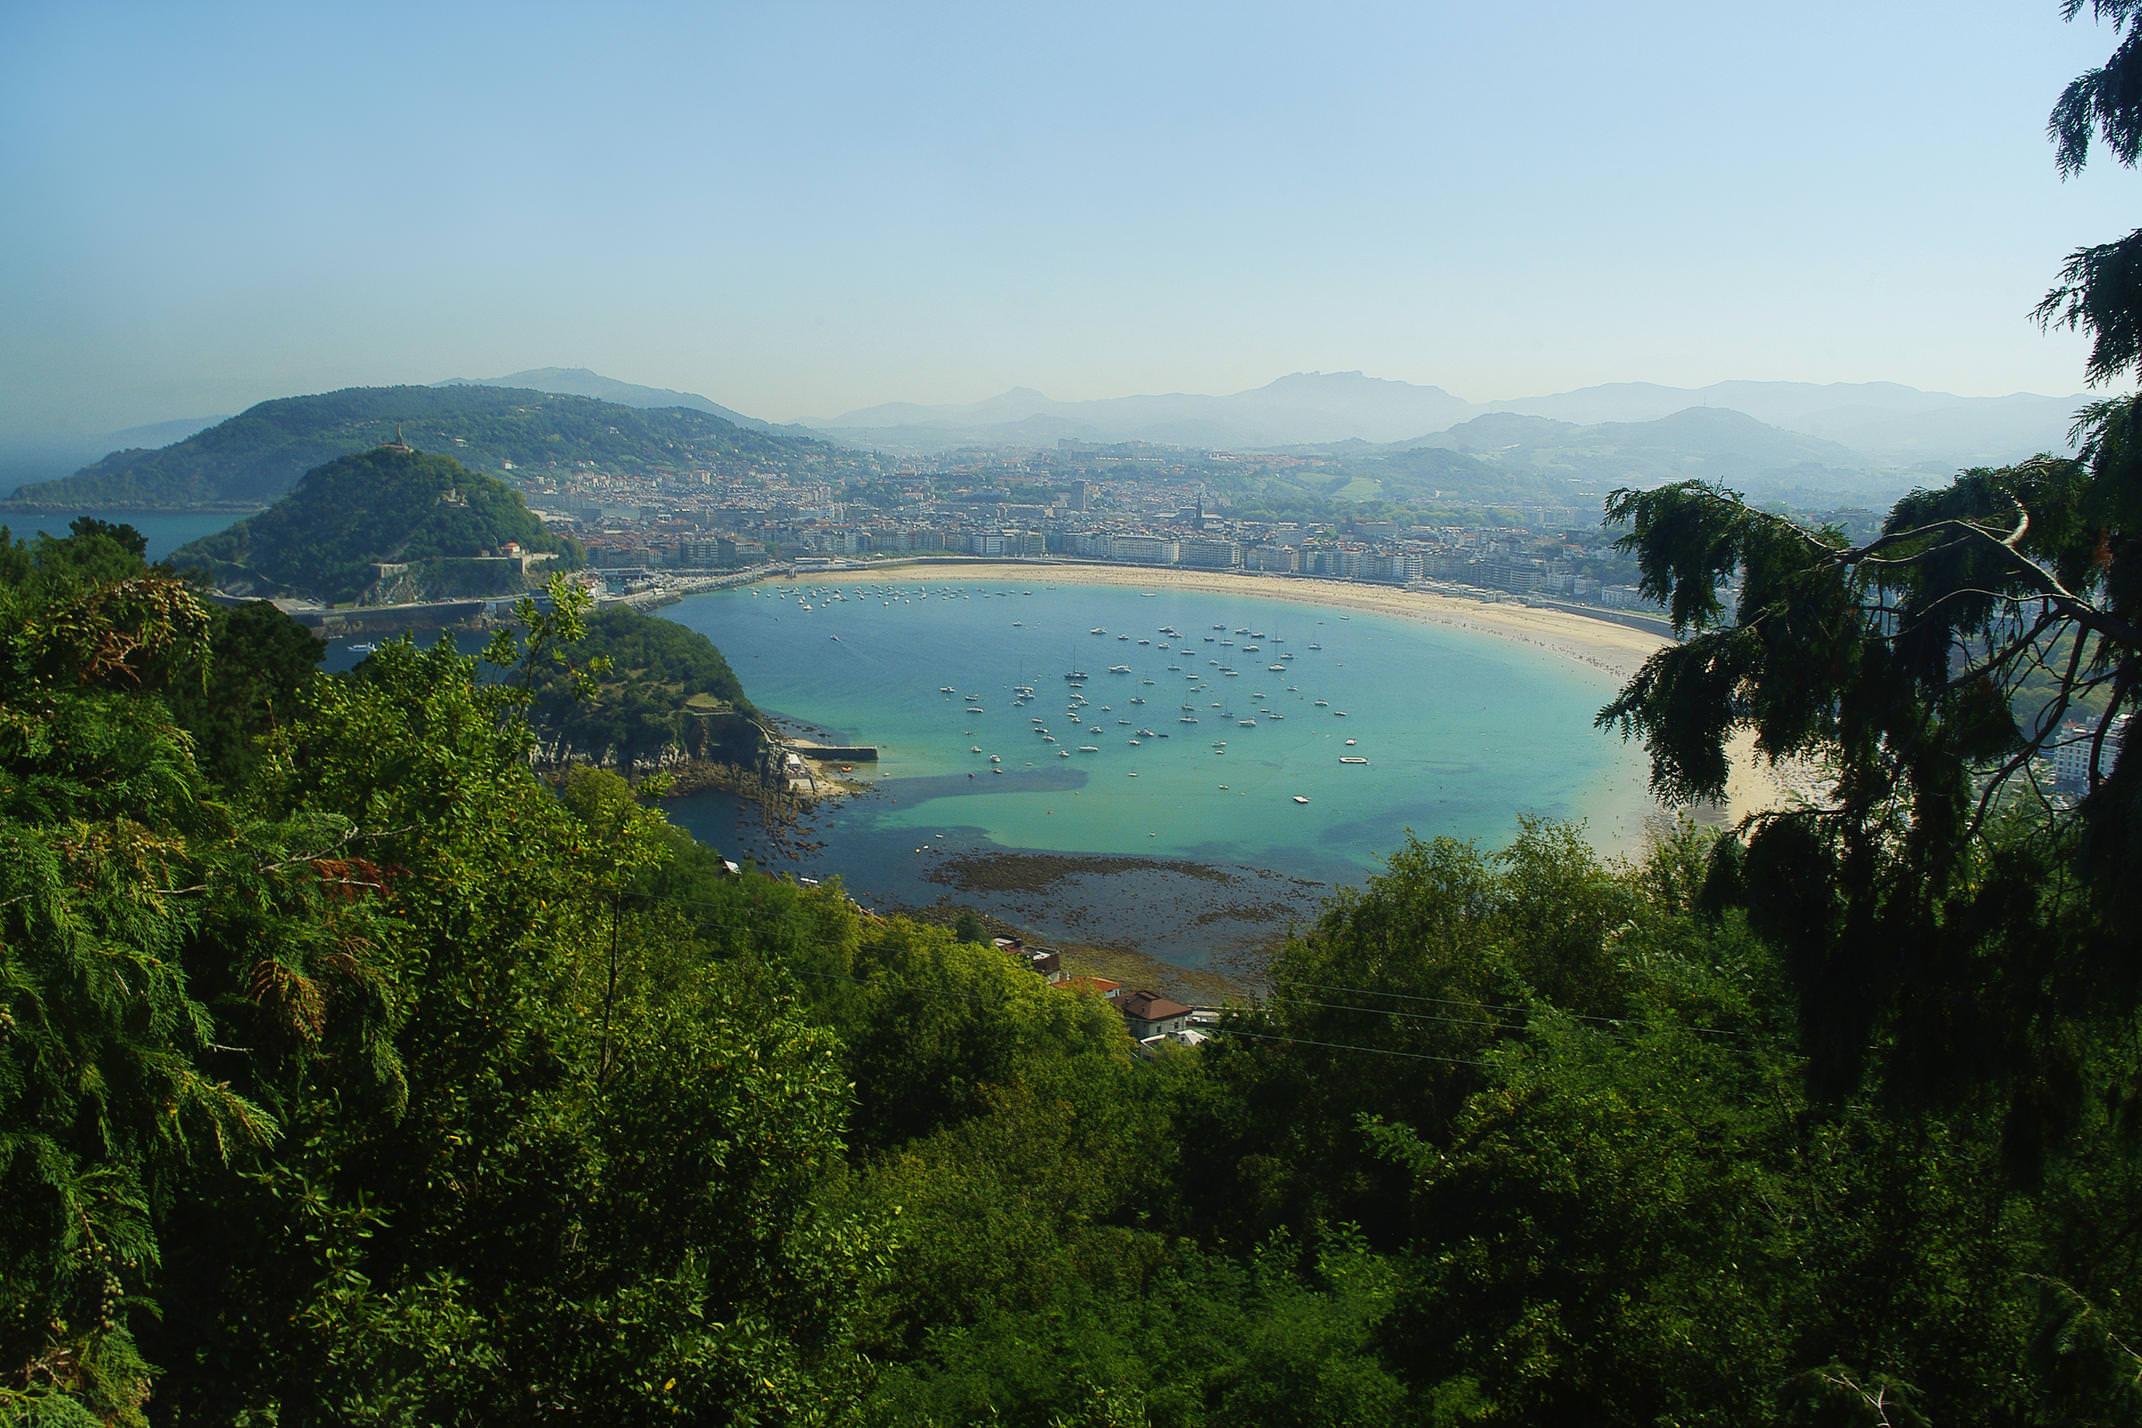 Spain san sebastian basque c chris bladon